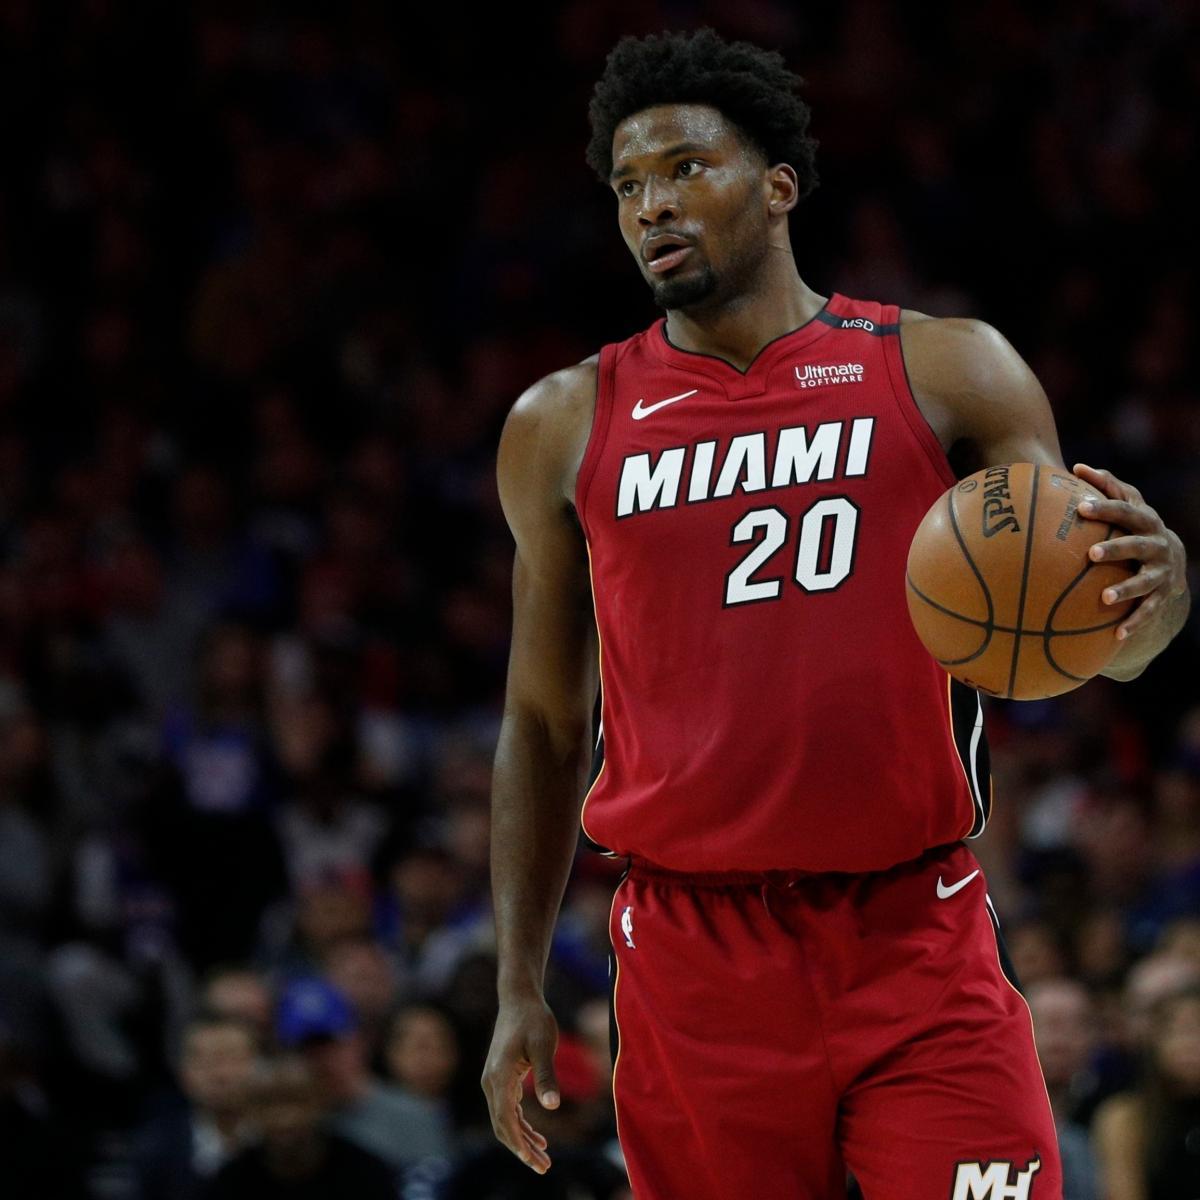 Justise Winslow Trade Rumors Surface as Heat Look to Land 2018 NBA Draft Pick